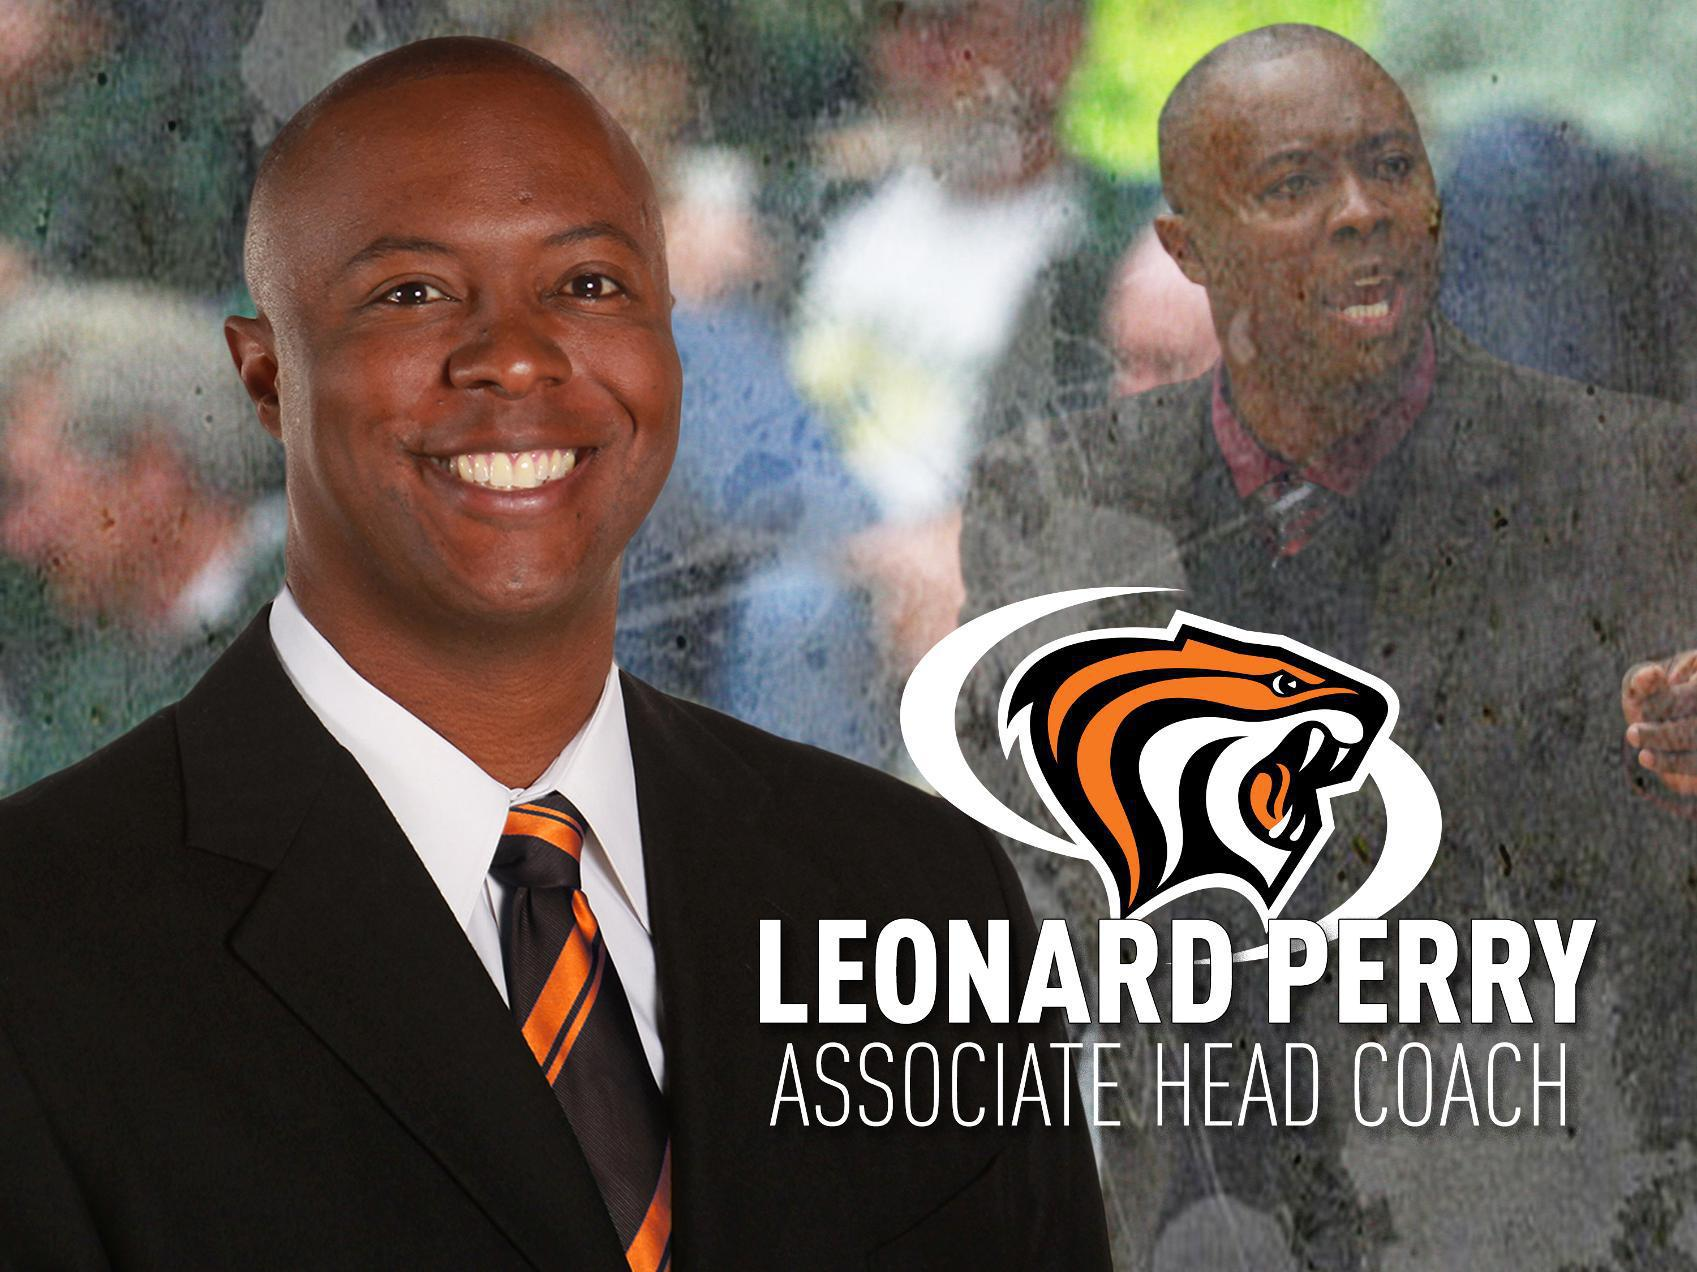 Leonard Perry Named Basketball's Associate Head Coach